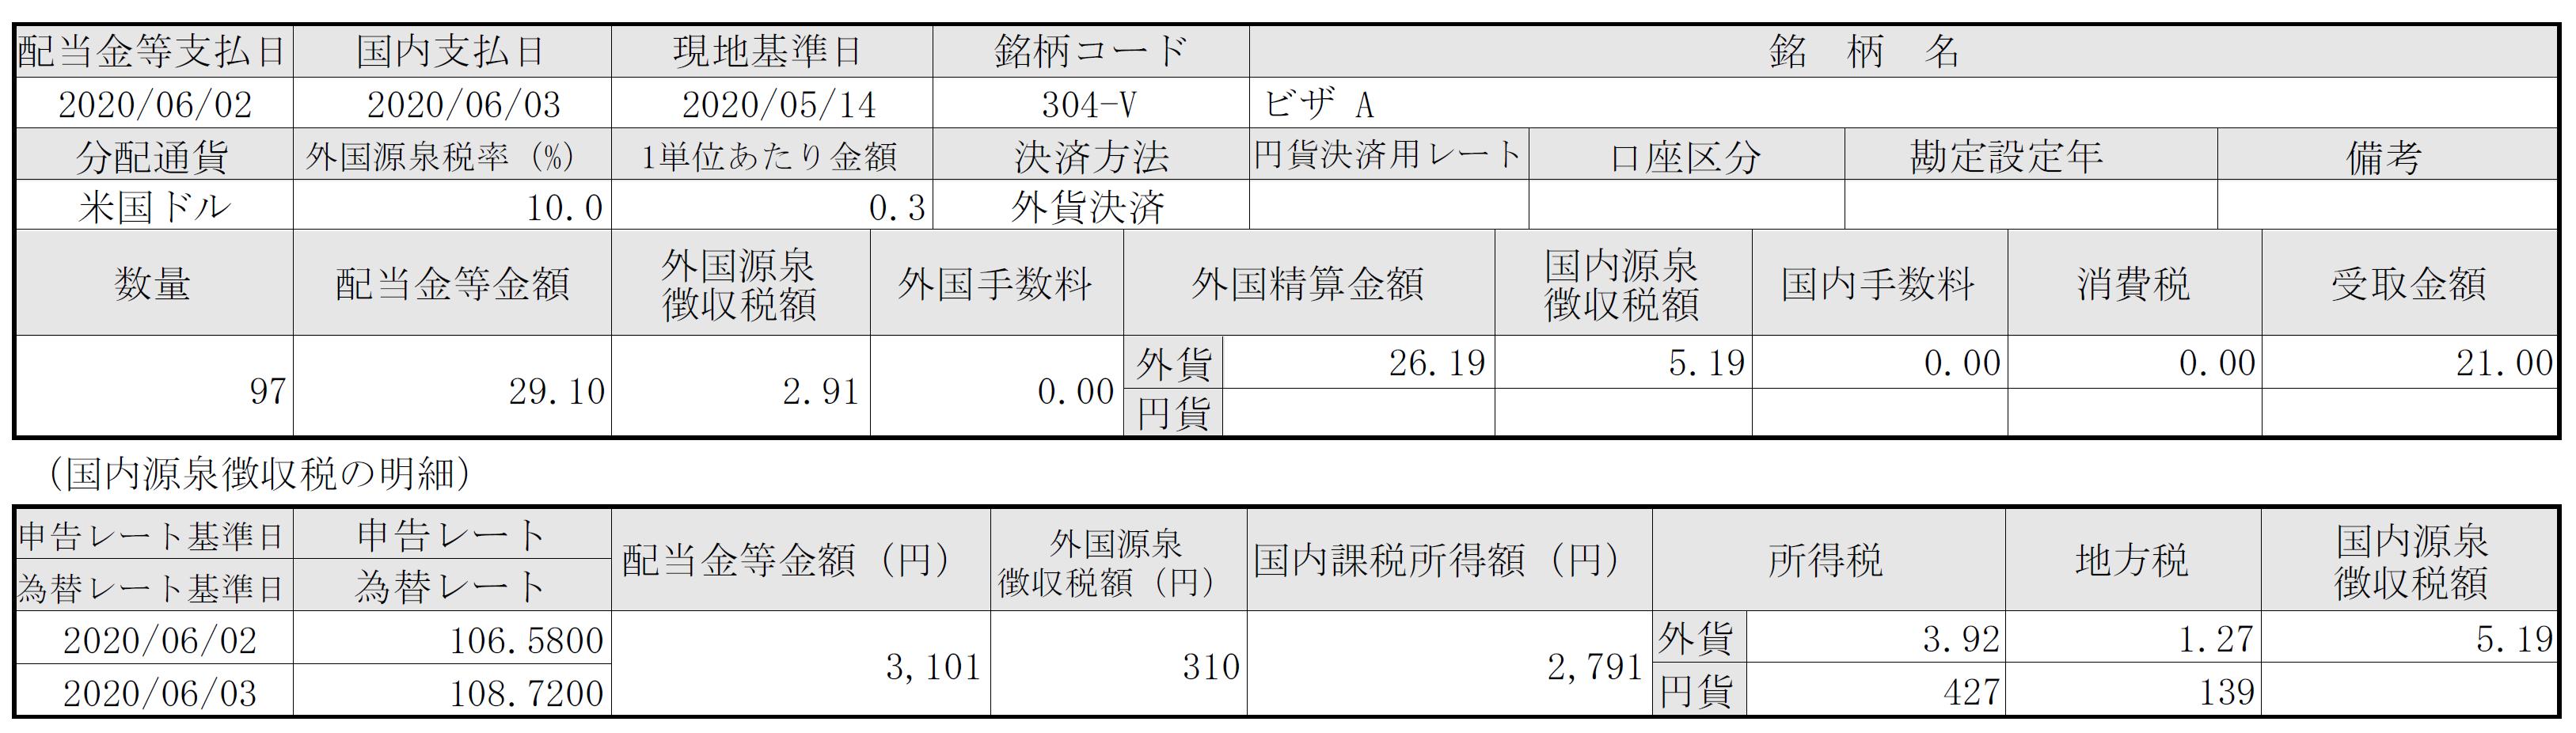 f:id:hodo-work:20200610145035p:plain